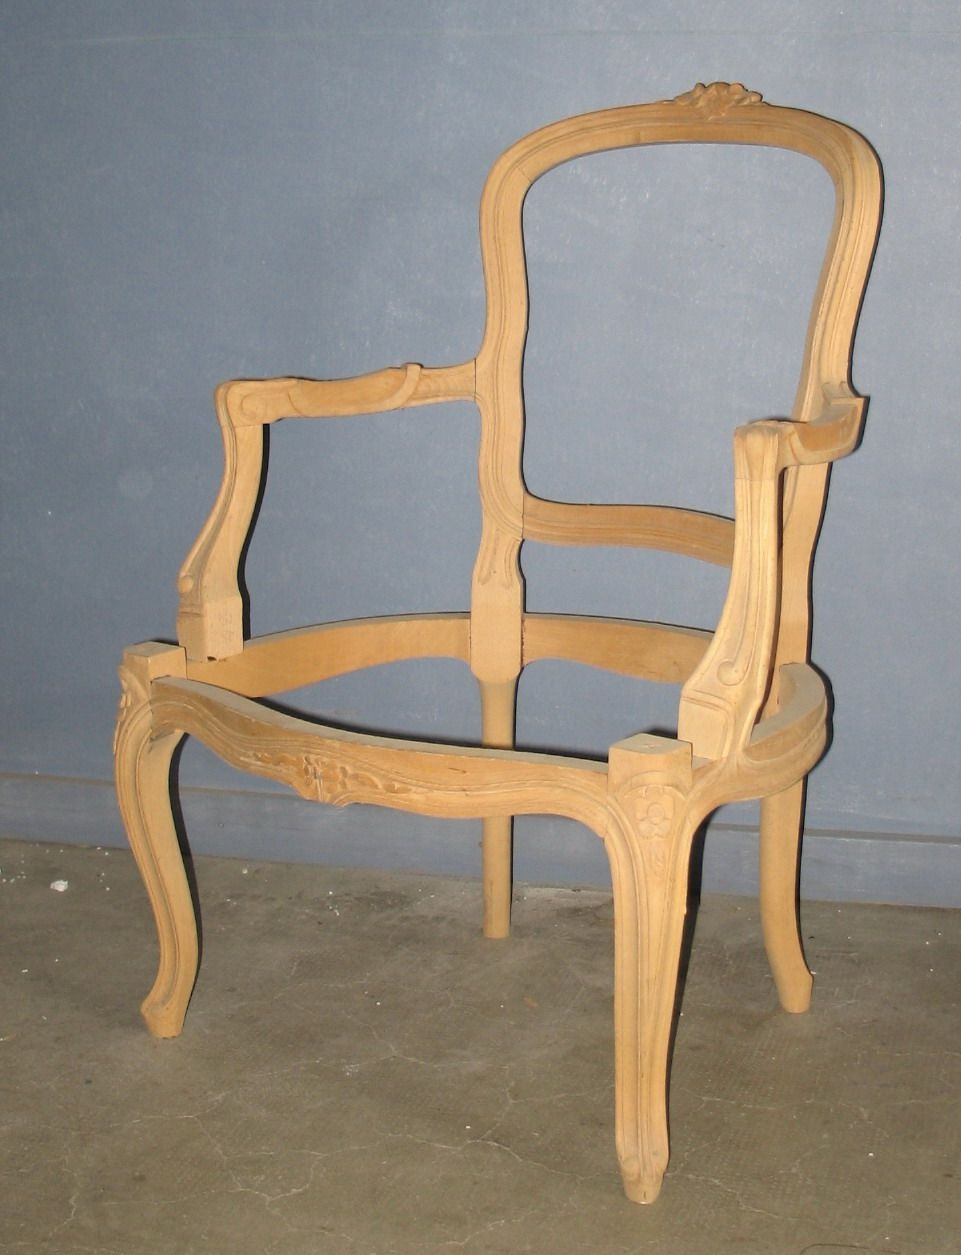 Louis xv frame louis xv chair pinterest for Chair in italian